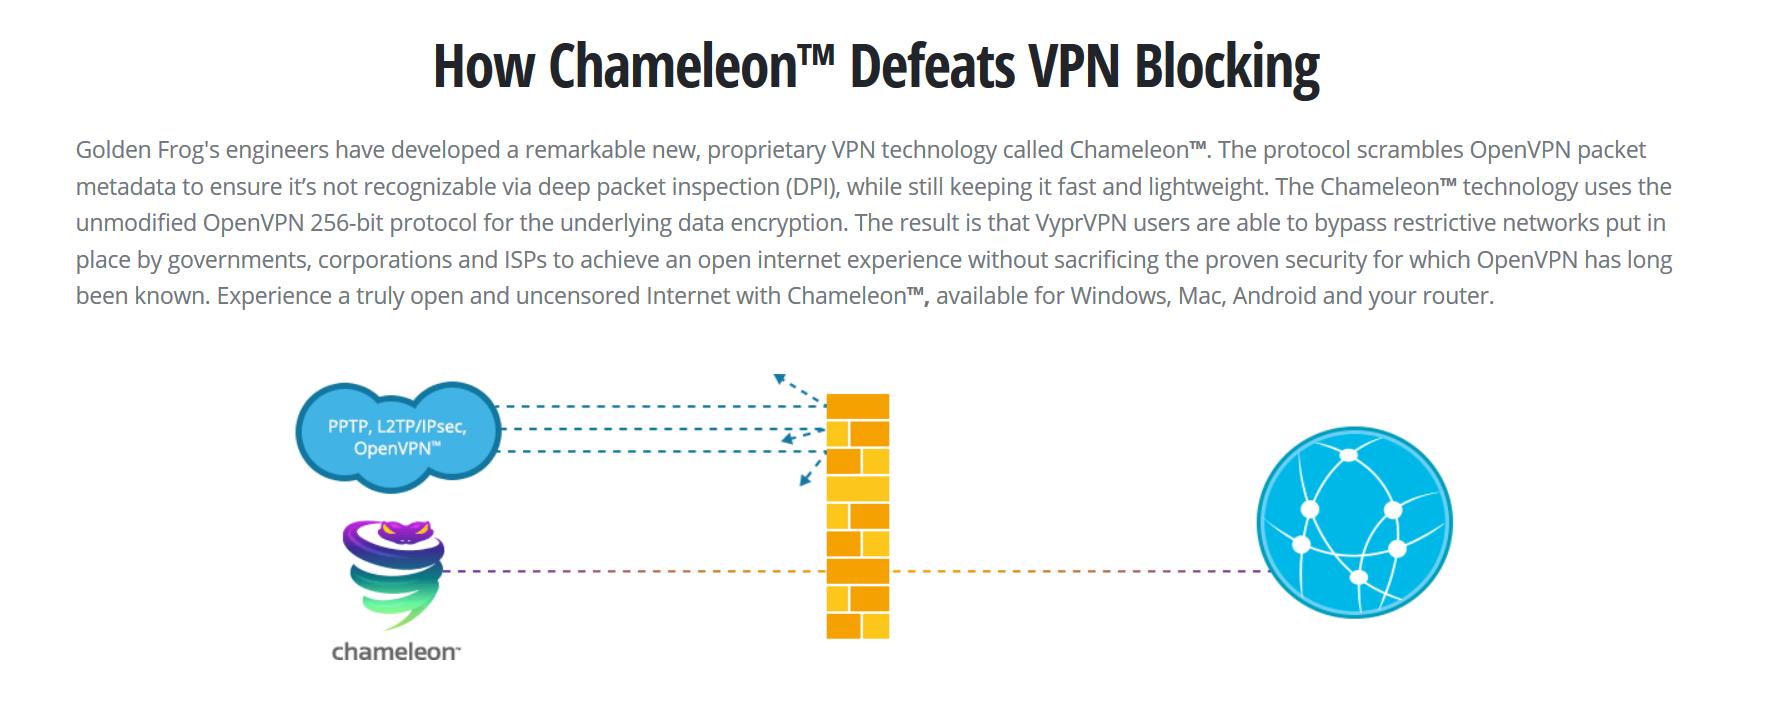 How Chameleon Defeats VPN Blocking